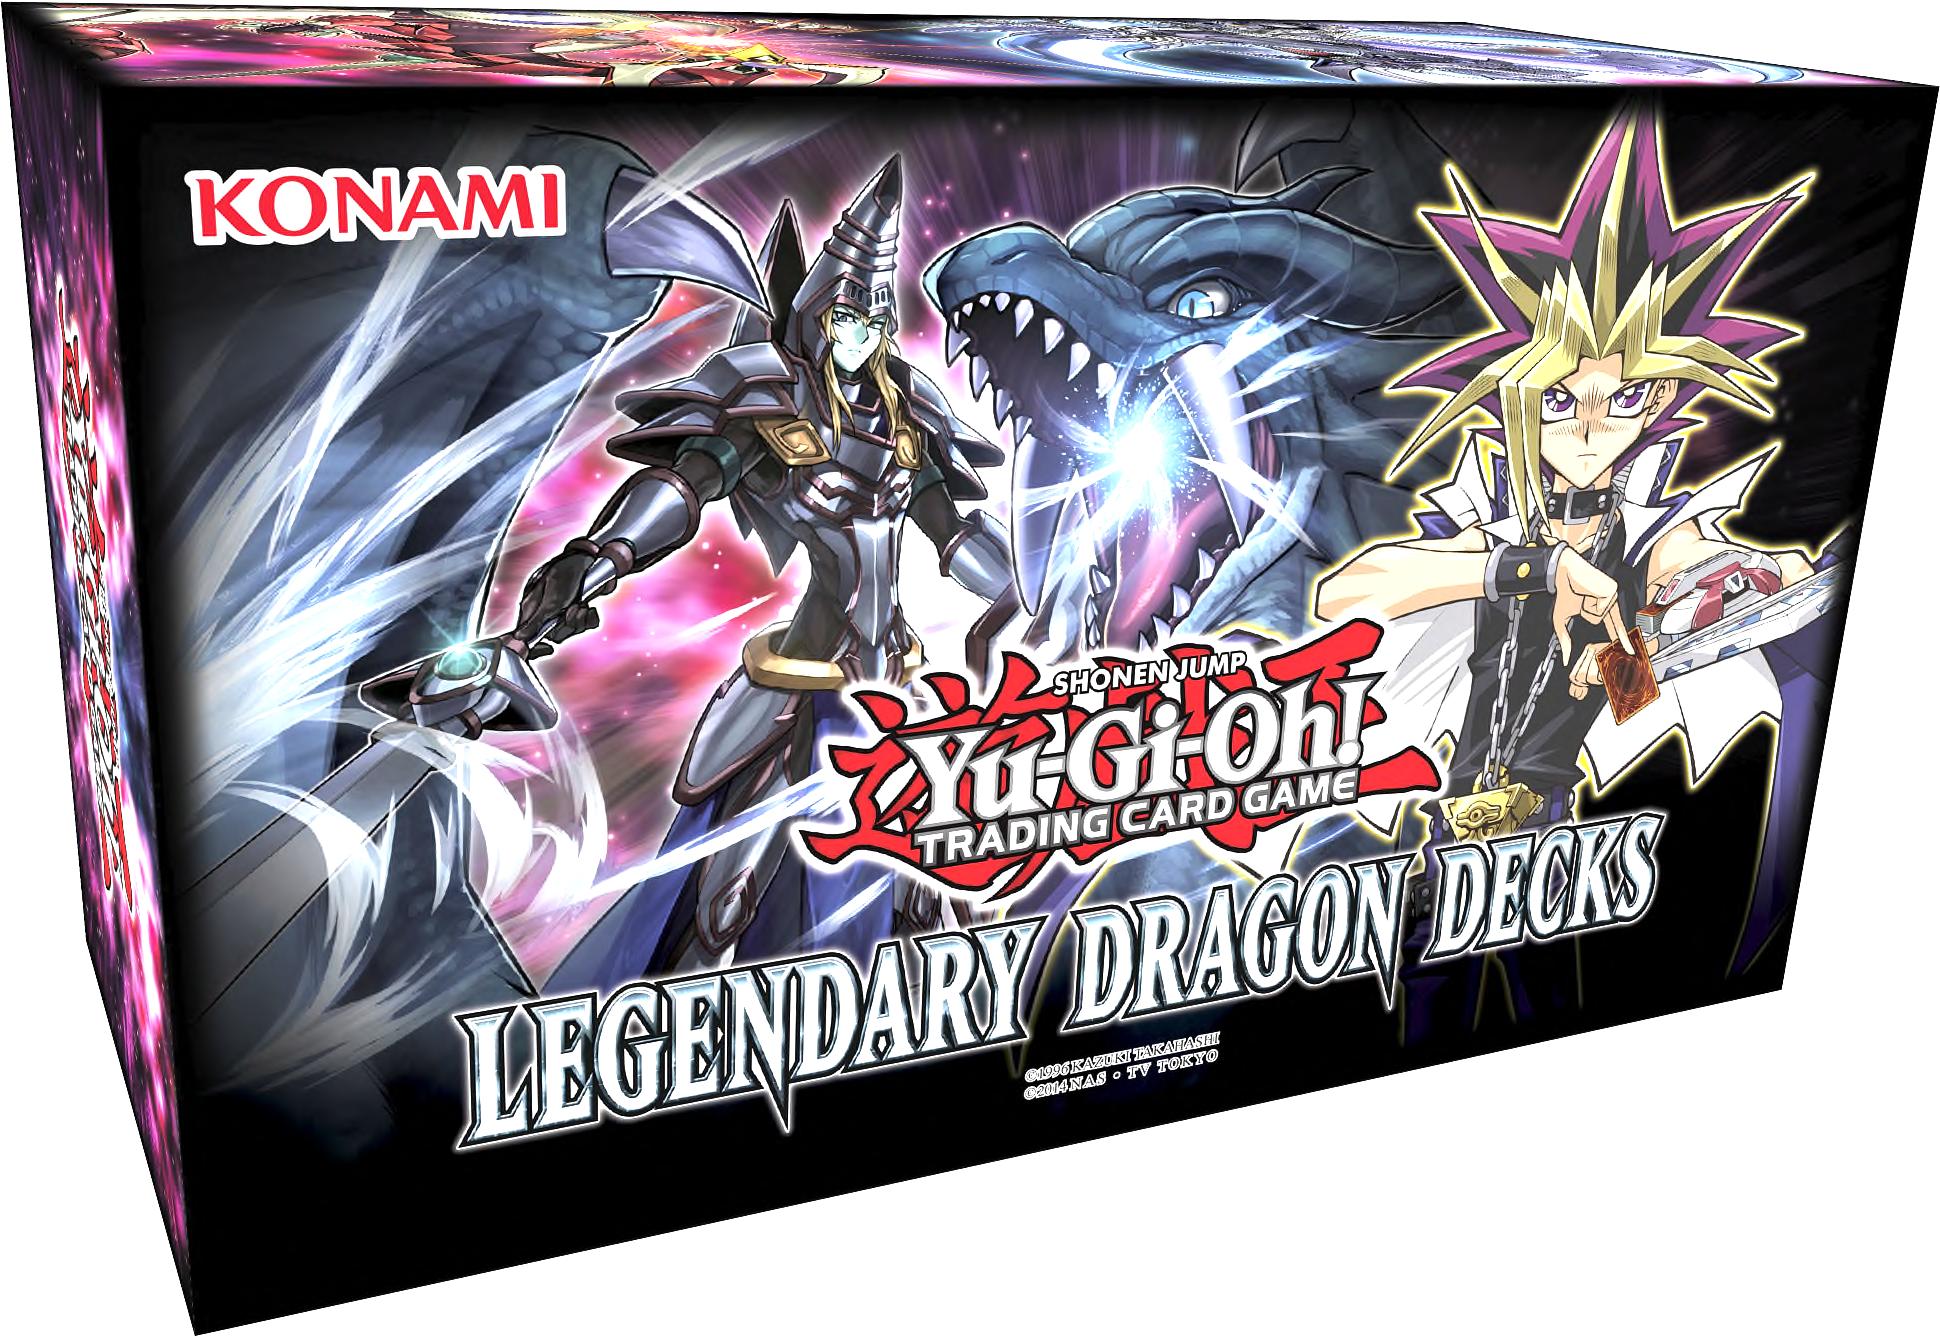 Image result for legendary dragon decks